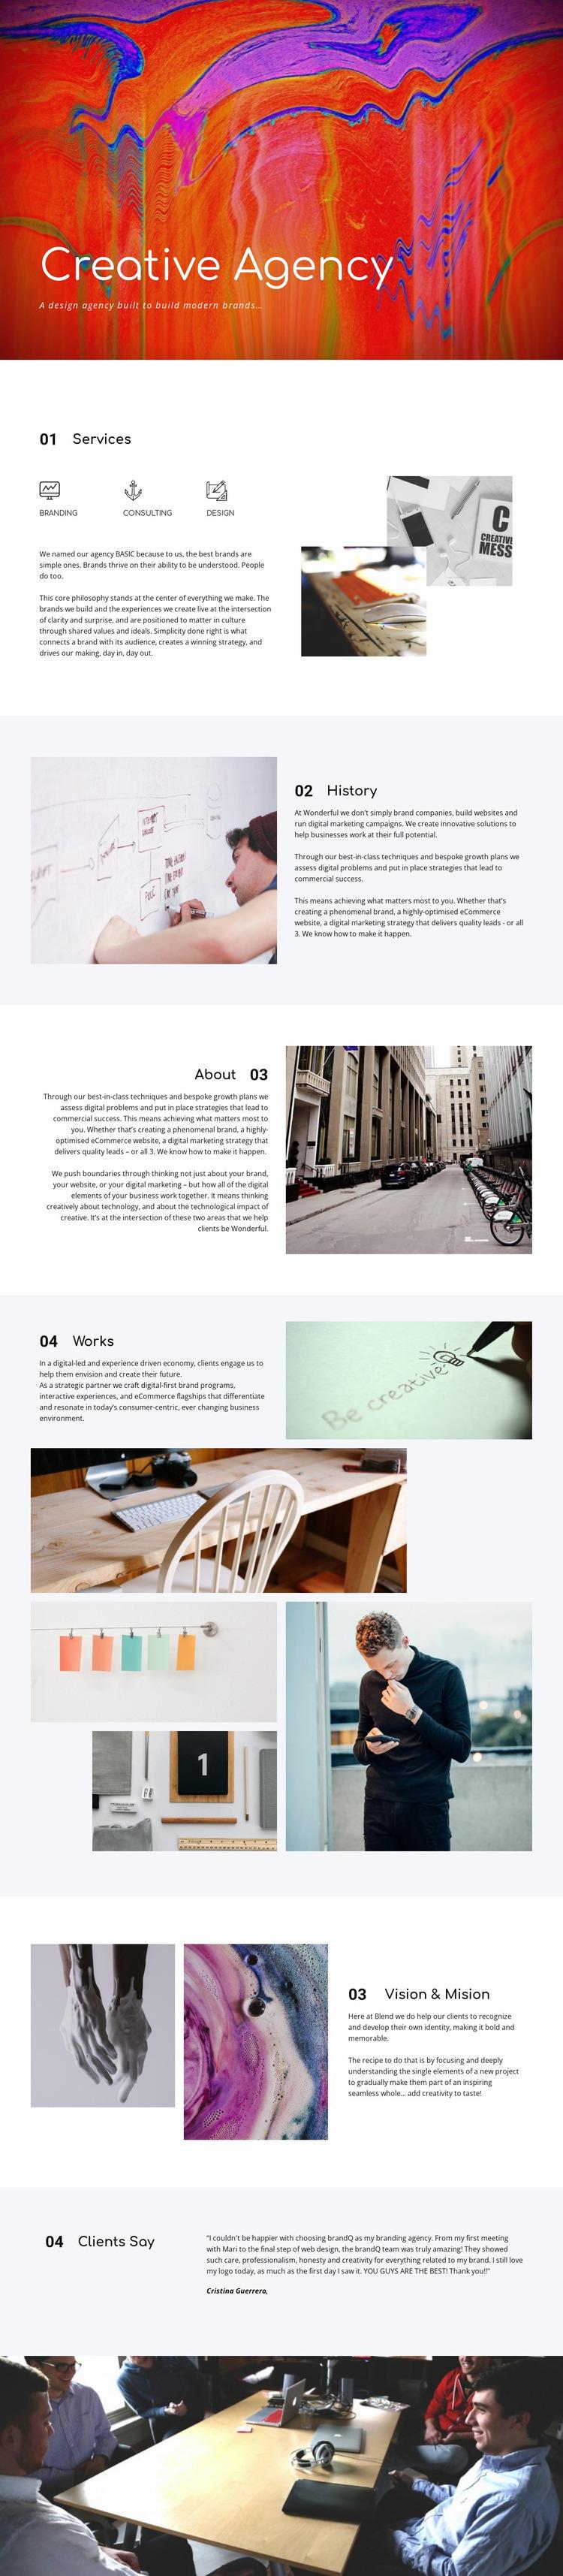 Creative gallery Website Mockup